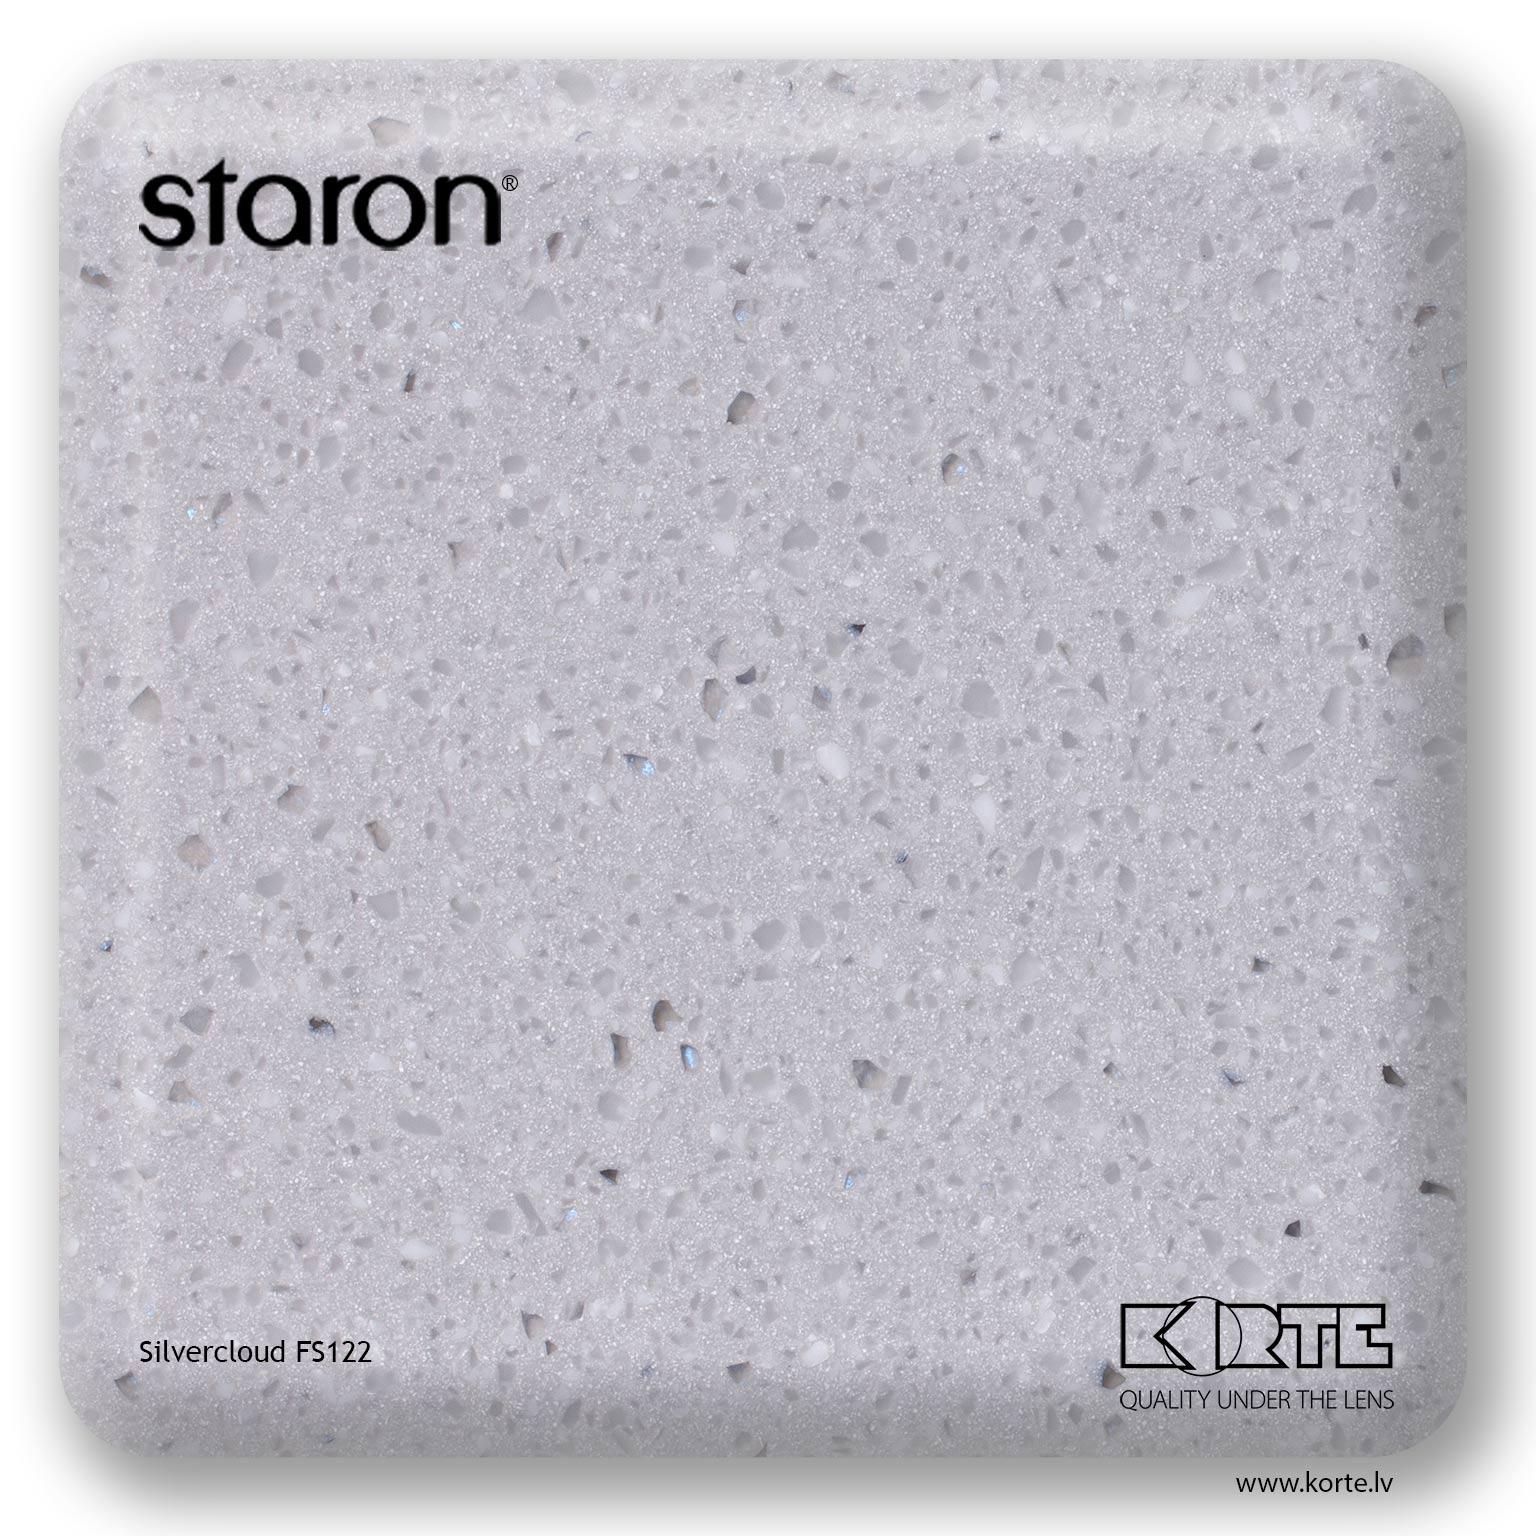 Staron Silvercloud FS122